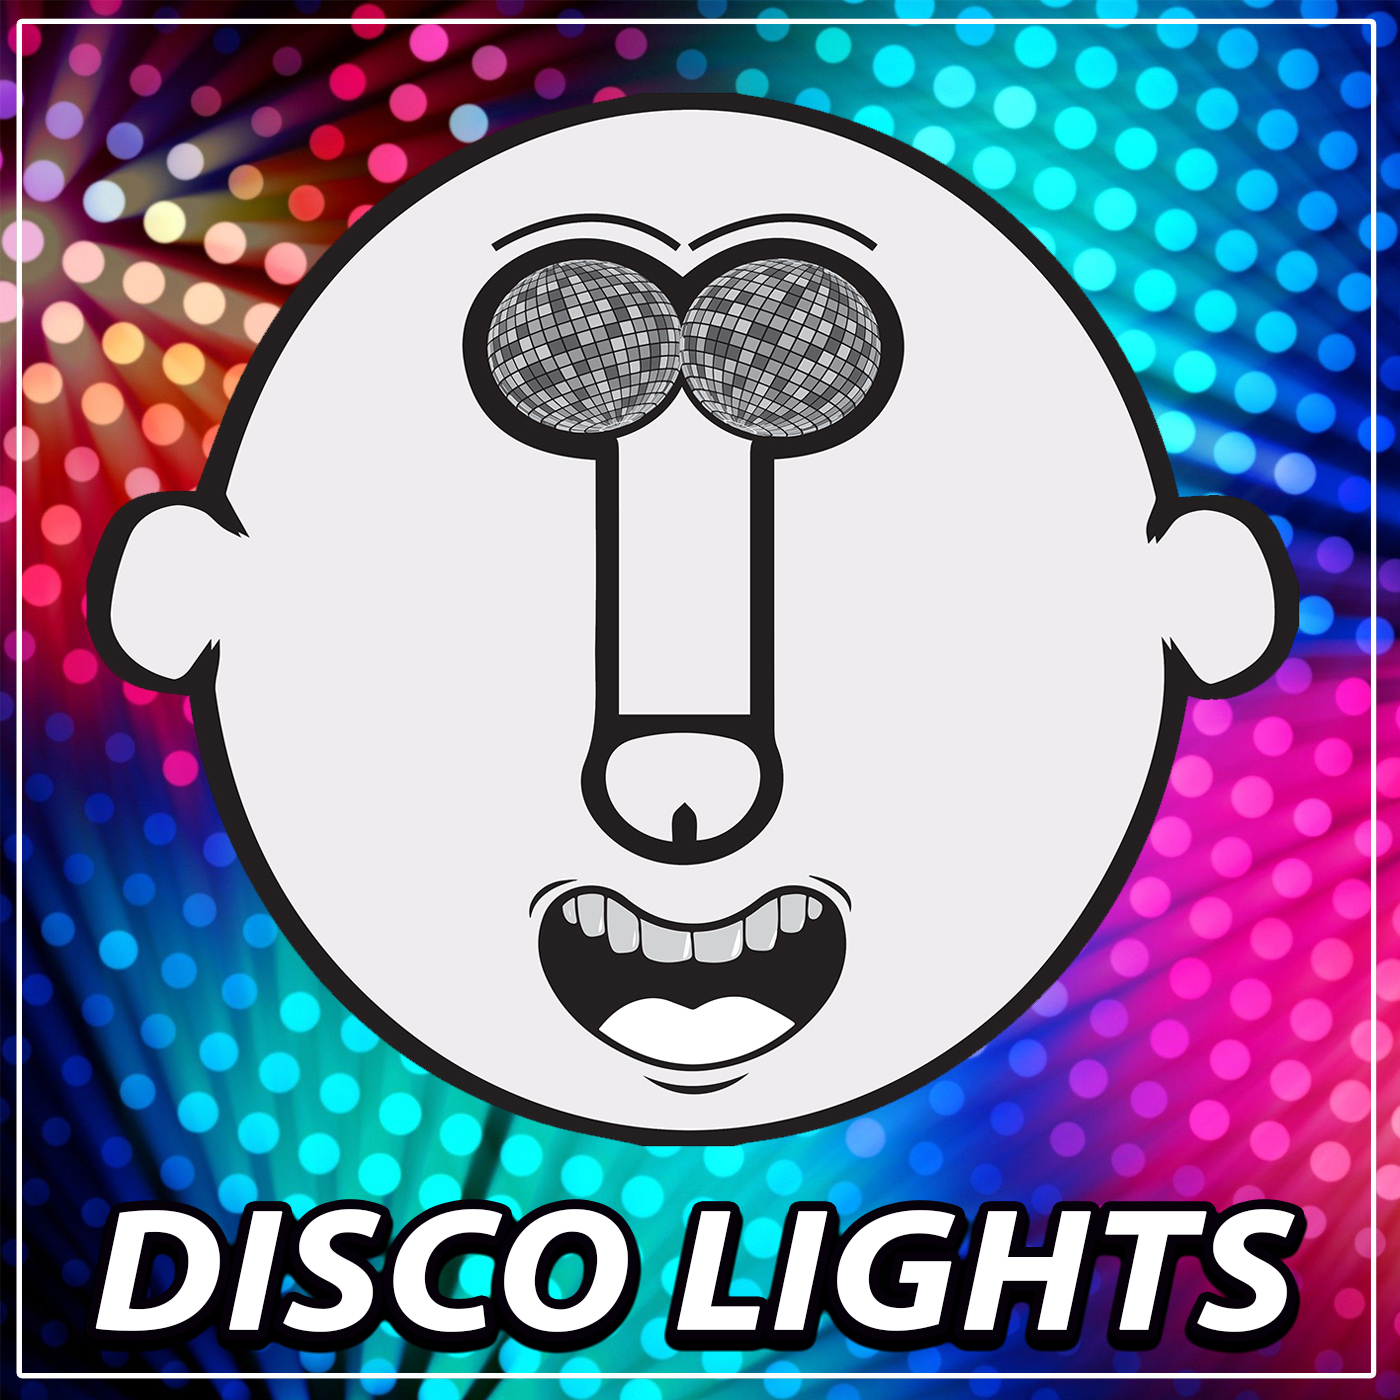 [OFDM010] DISCO DIKC - Disco Lights.jpg